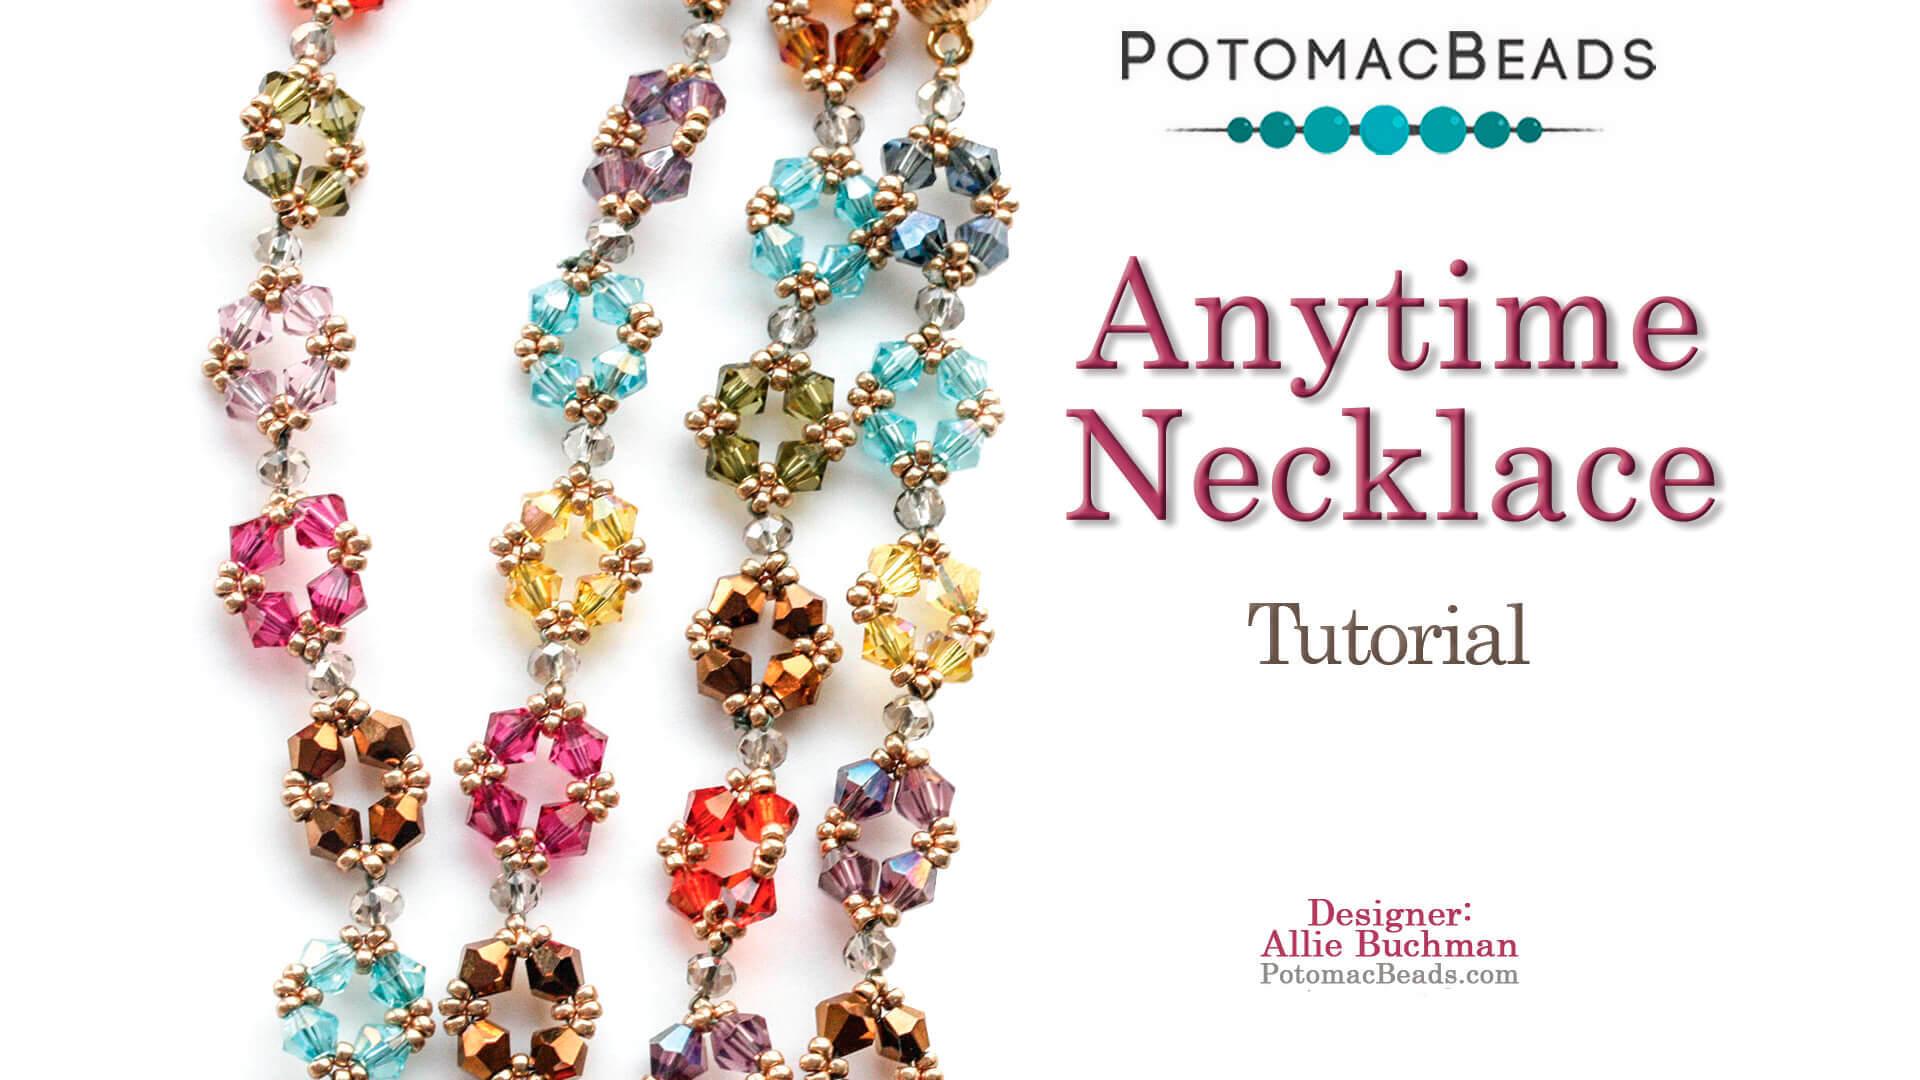 How to Bead Jewelry / Beading Tutorials & Jewel Making Videos / Bead Weaving Tutorials & Necklace Tutorial / Anytime Necklace Tutorial